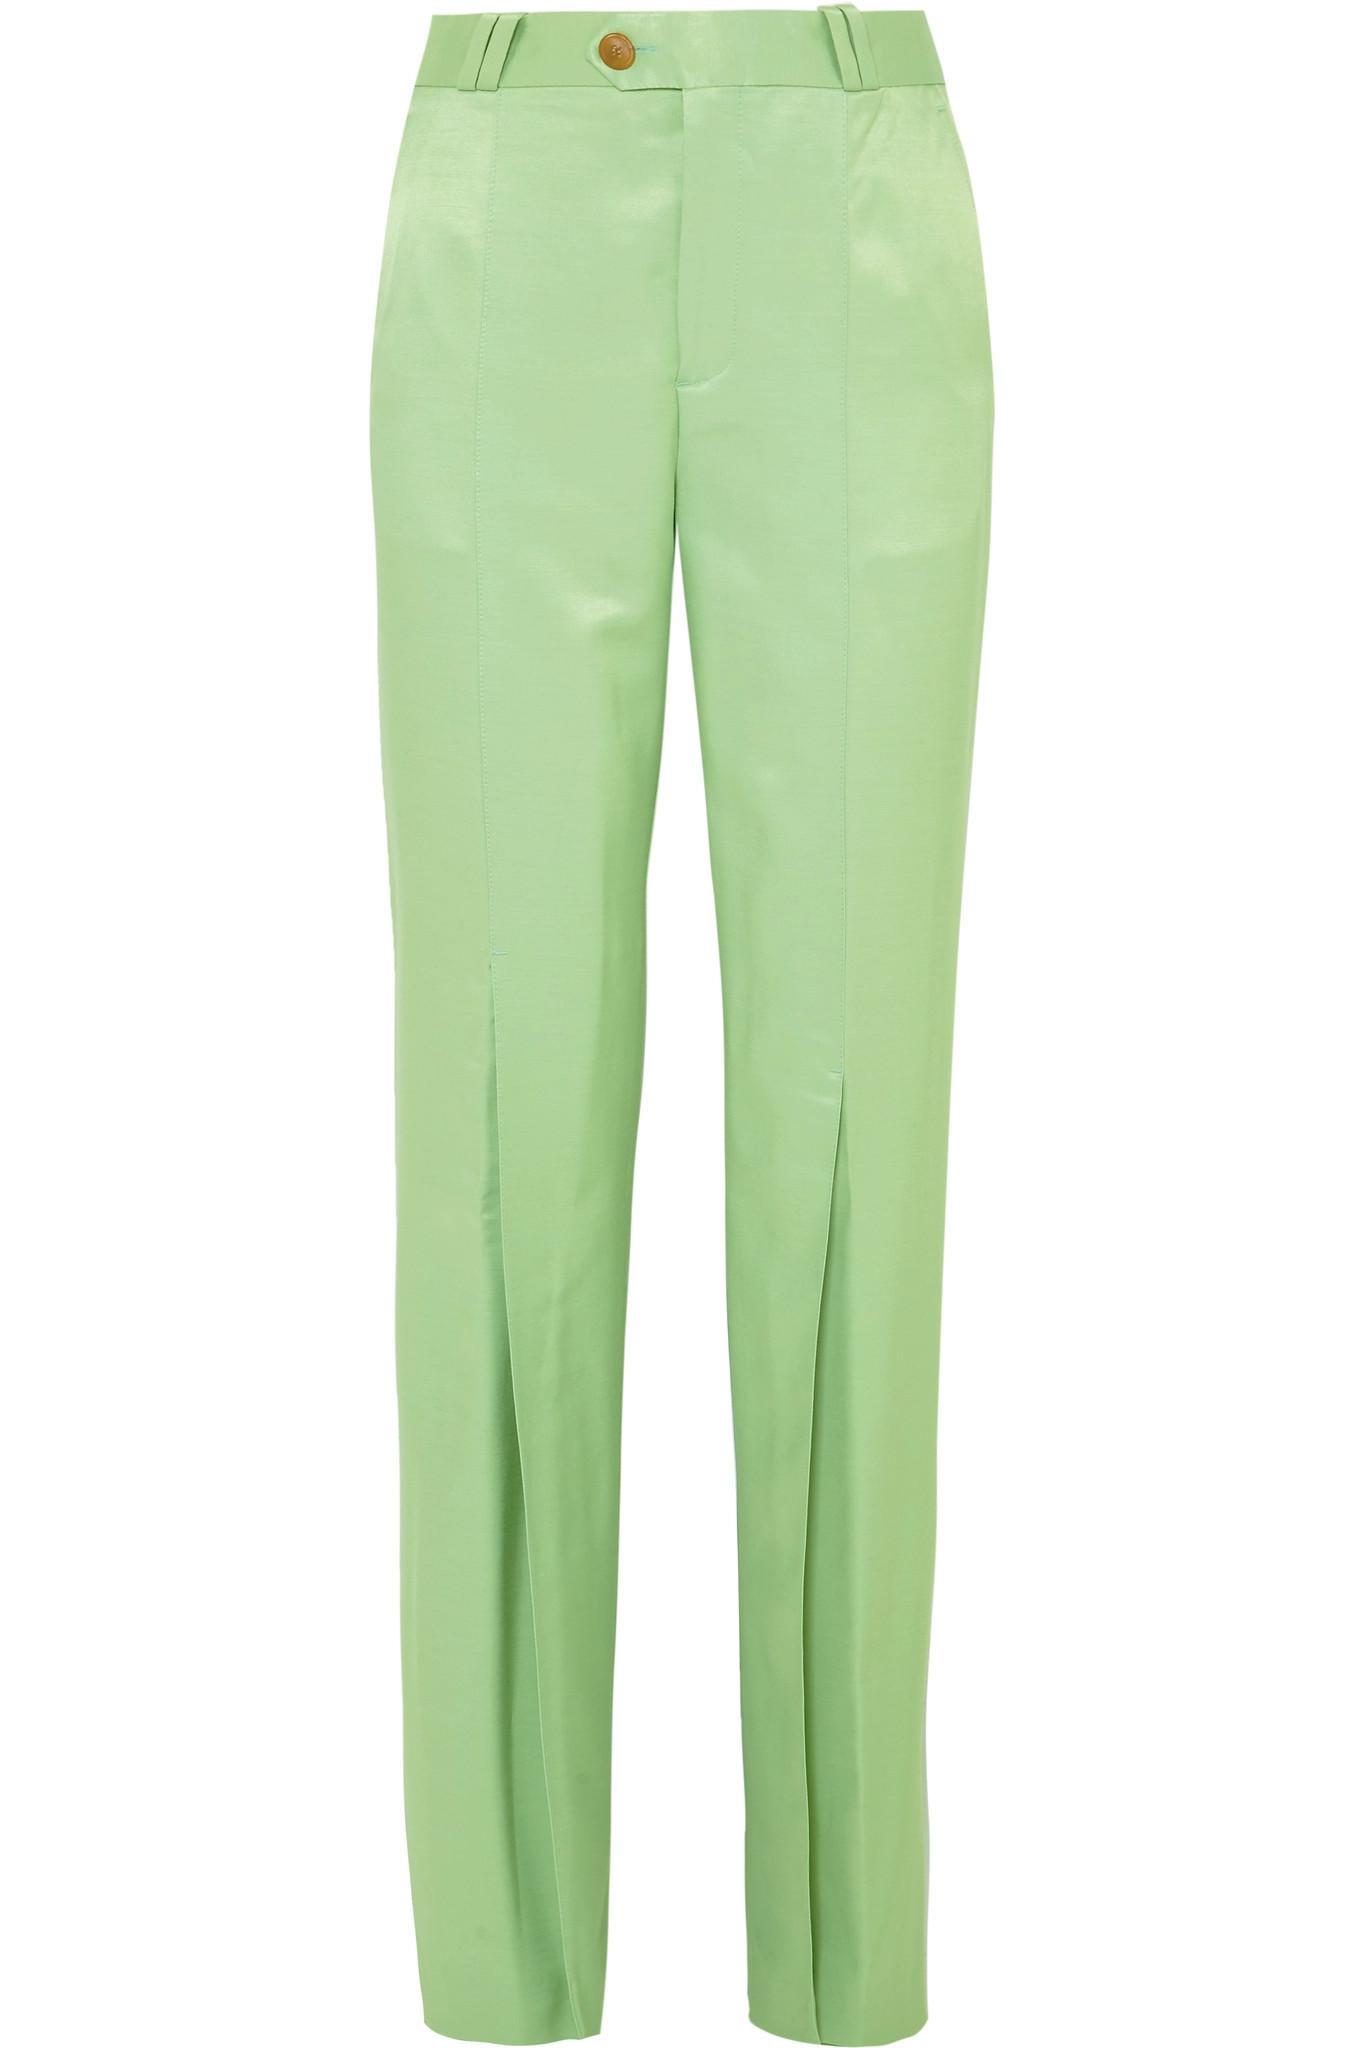 Clearance Wiki Tohny straight-leg trousers Acne Studios Pre Order Cheap Online bGFOlI4Y